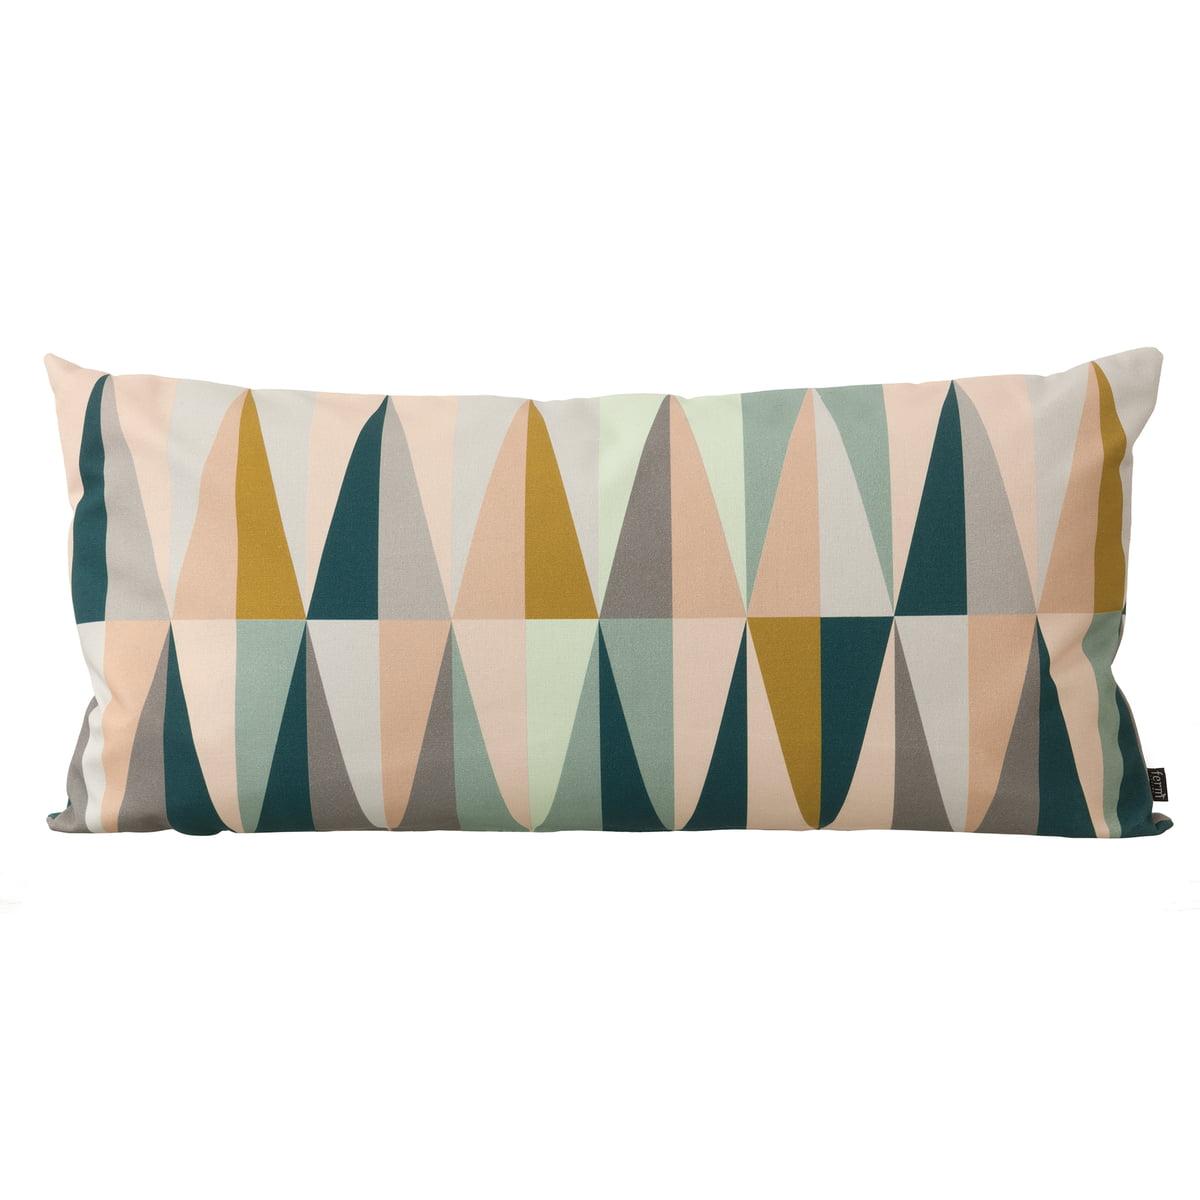 spear kissen von ferm living shop. Black Bedroom Furniture Sets. Home Design Ideas